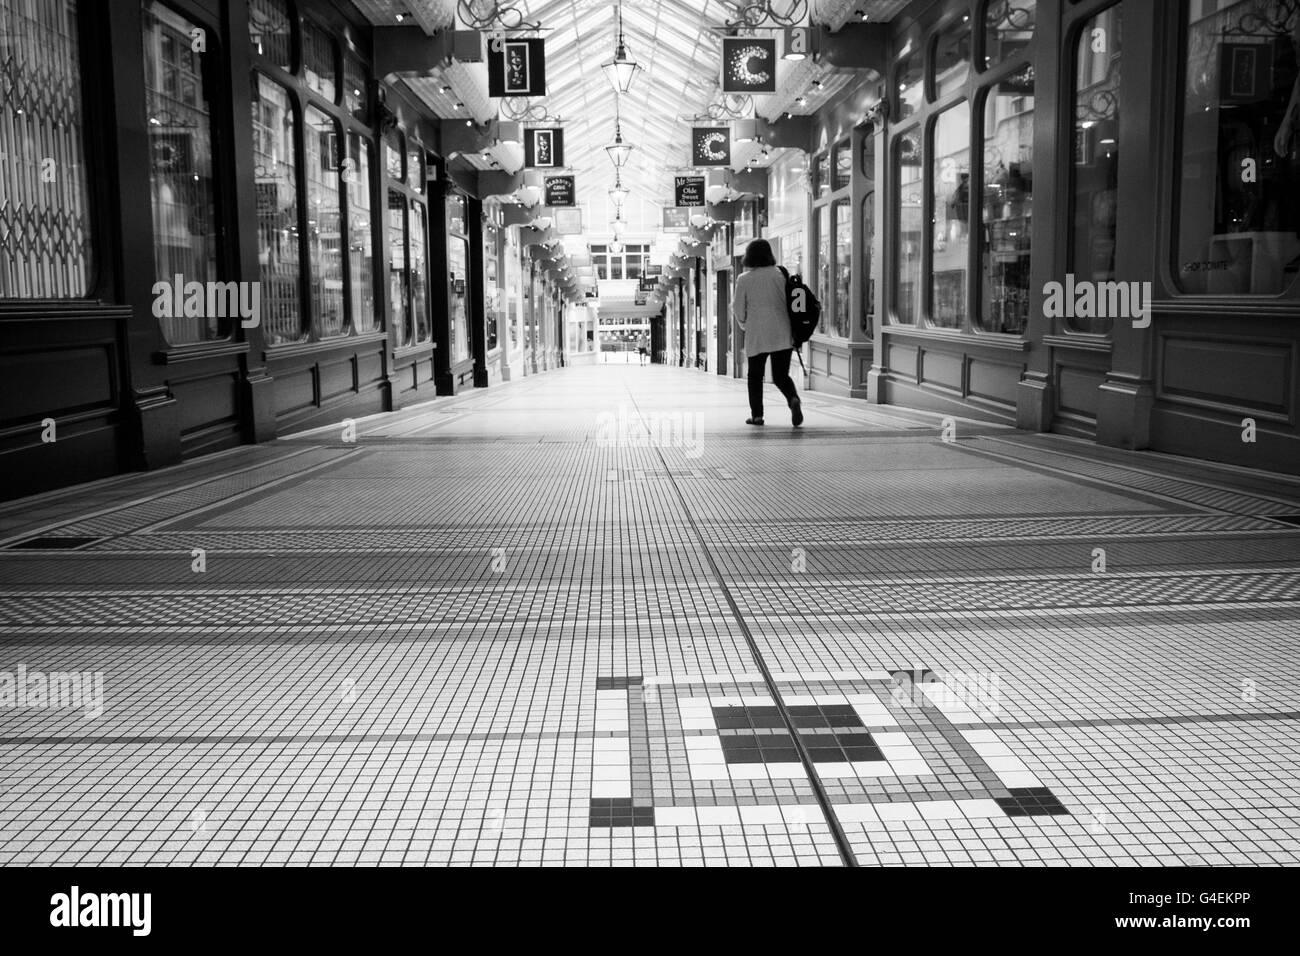 Thorntons Arcade, Leeds, West Yorkshire, England. - Stock Image